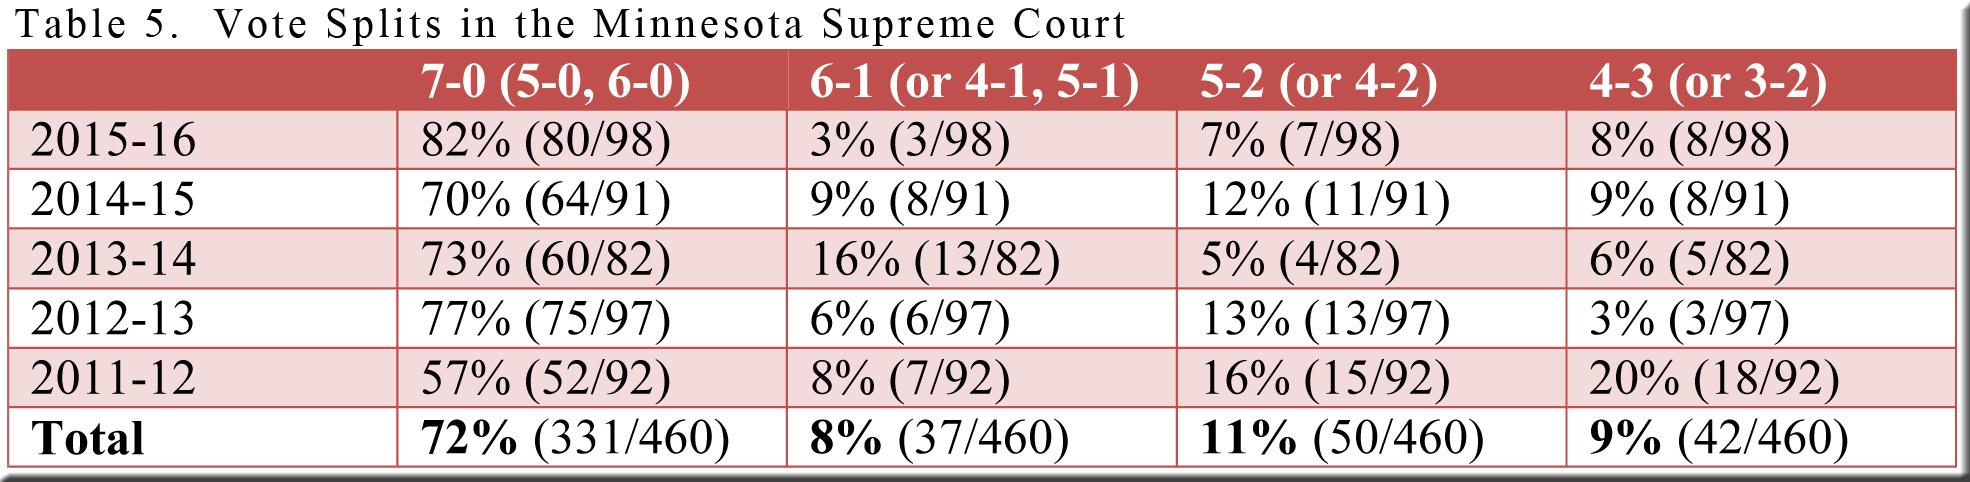 table-5-mn-vote-splits-2011-12-thru-2015-16